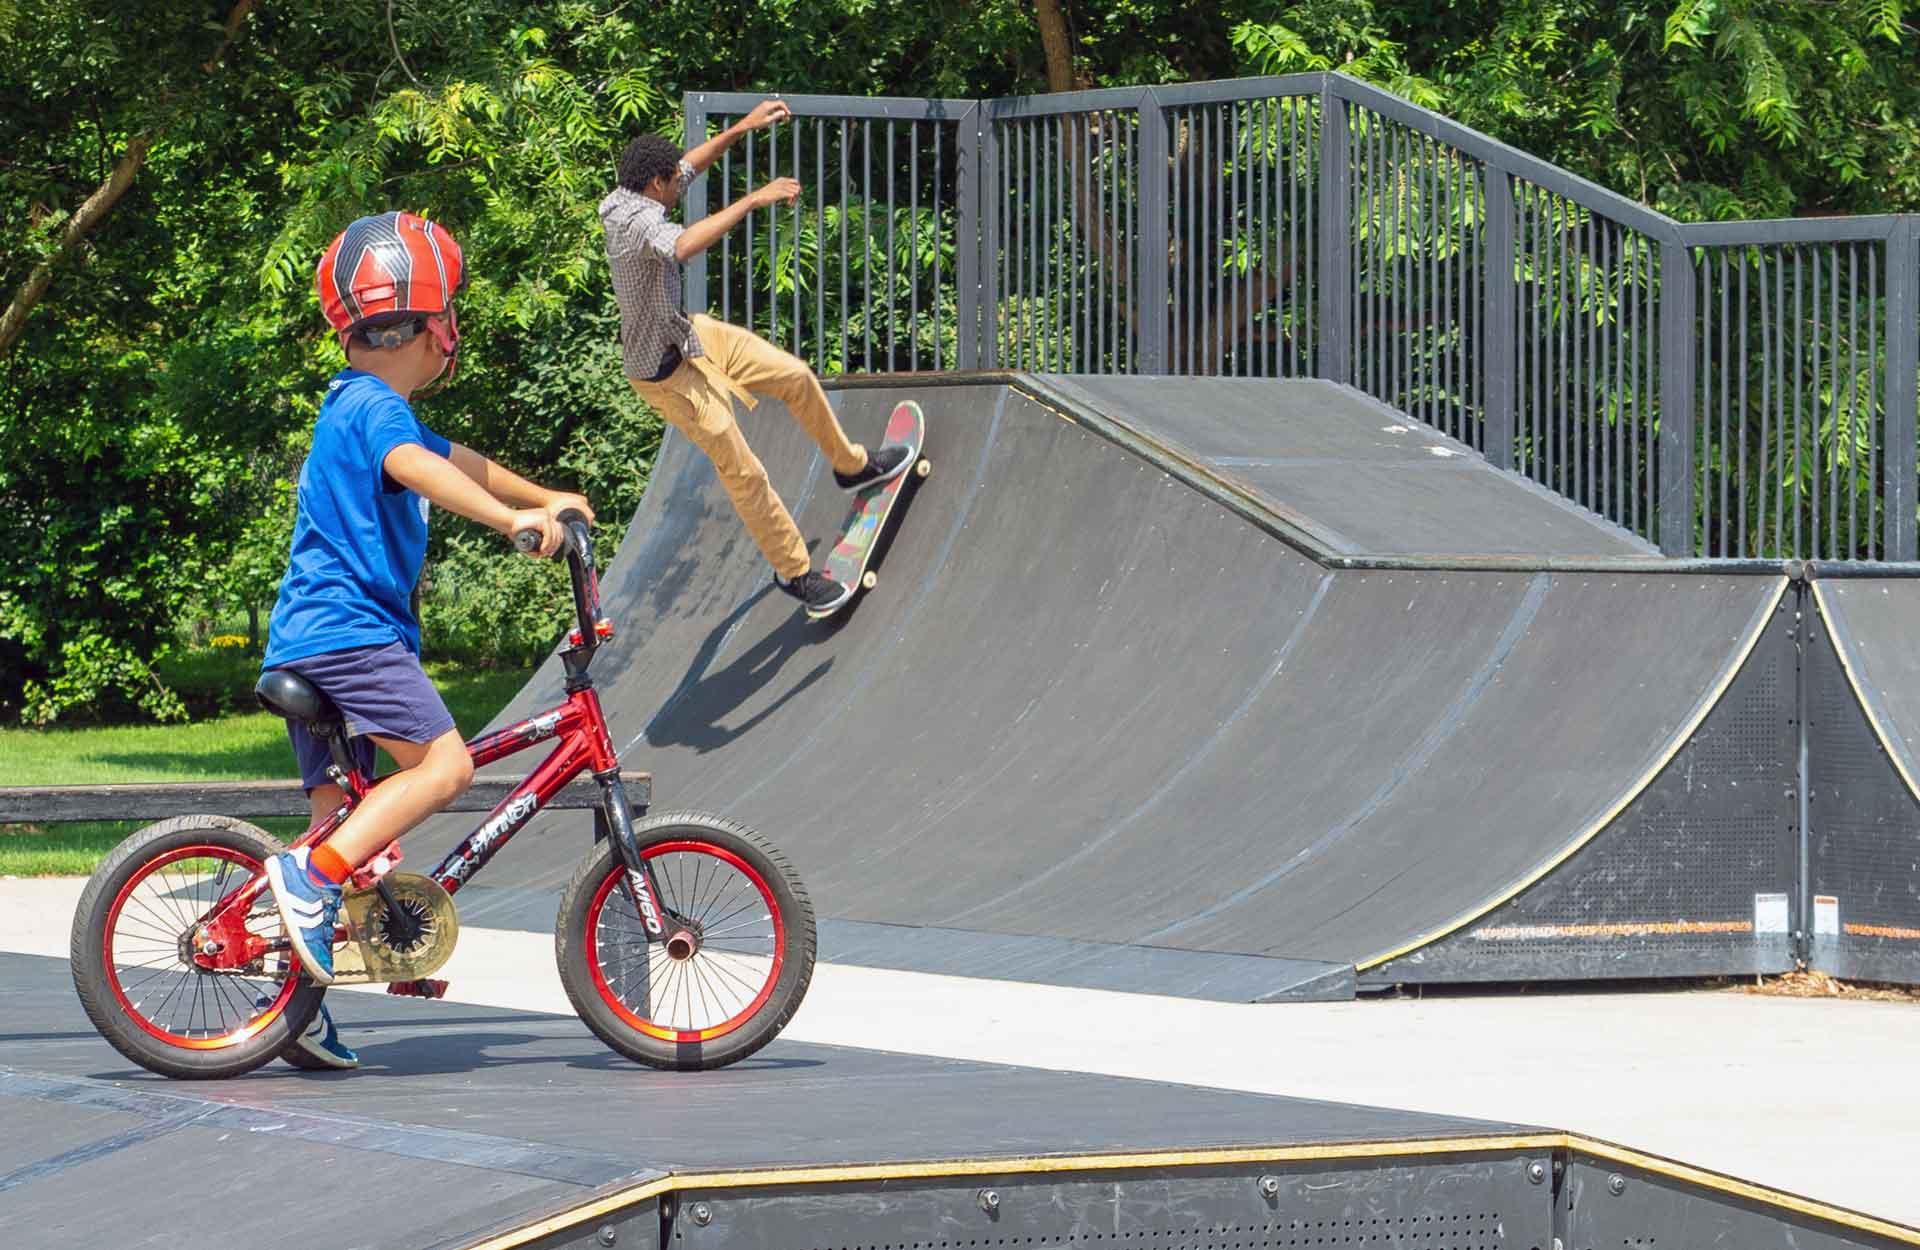 Bolingbrook Park District Indian Boundary Skate Plaza